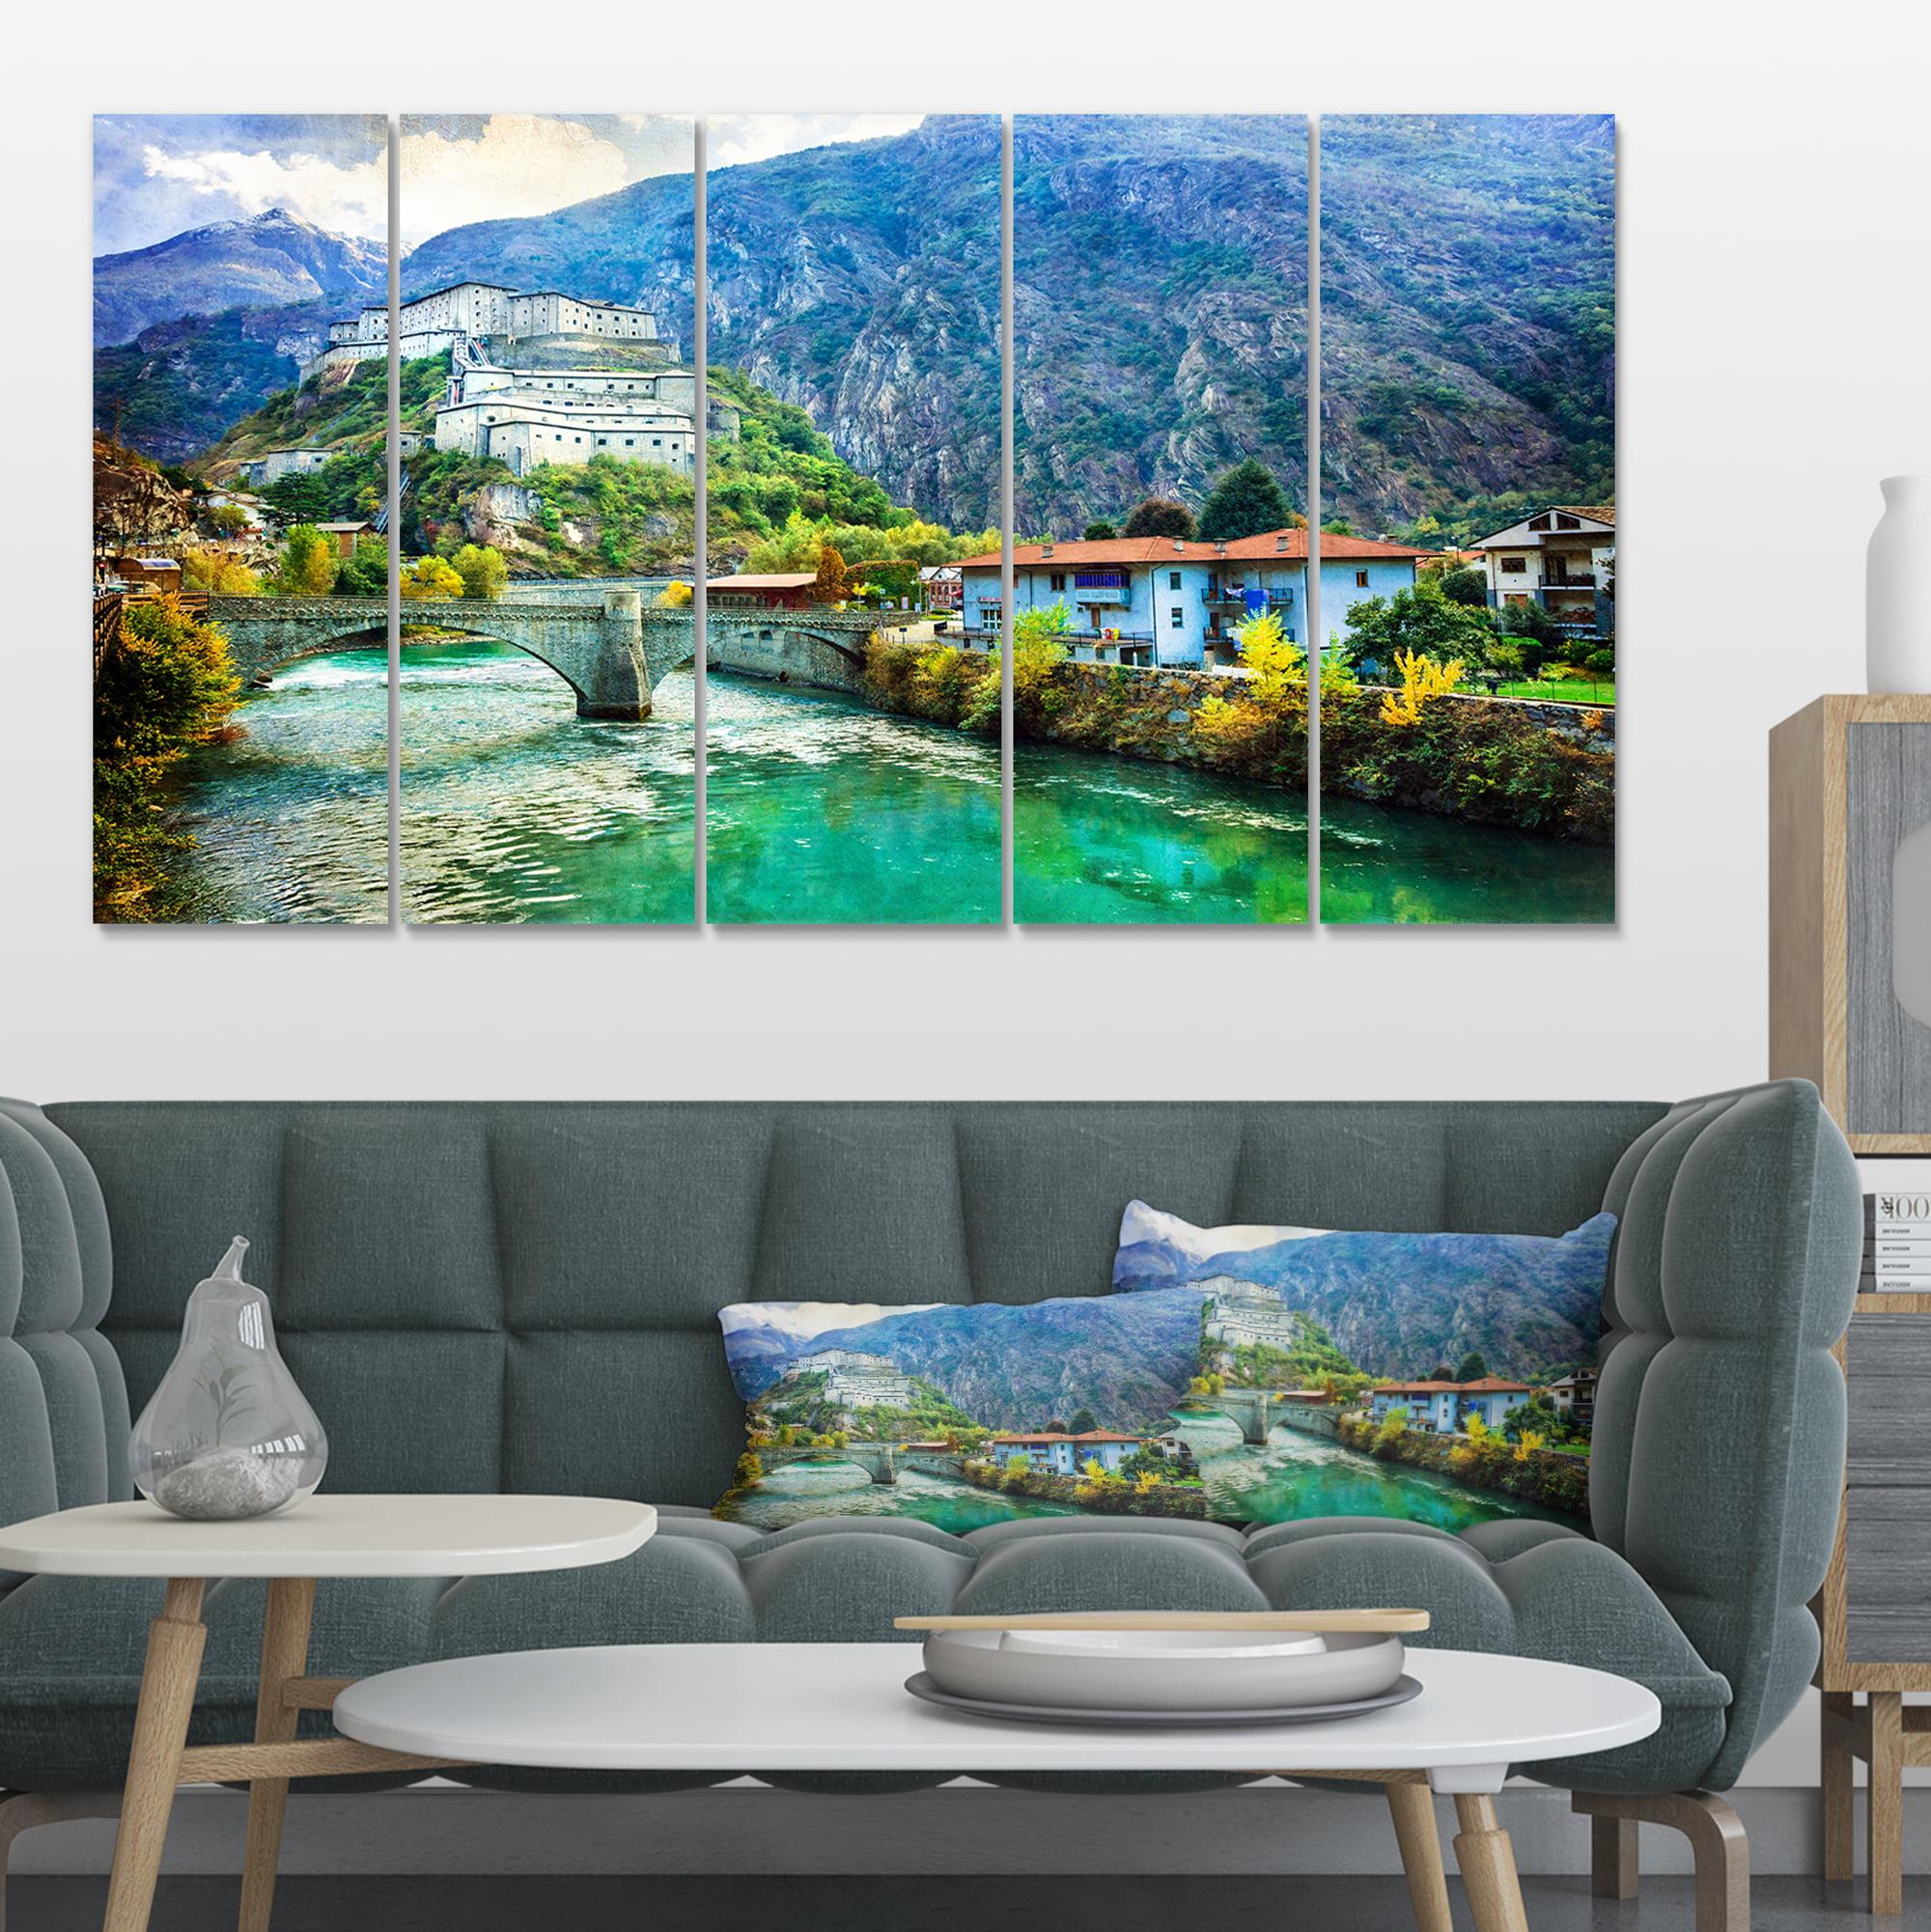 Valle d Aosta Castles Italy - Landscape Canvas Art Print - image 4 of 4